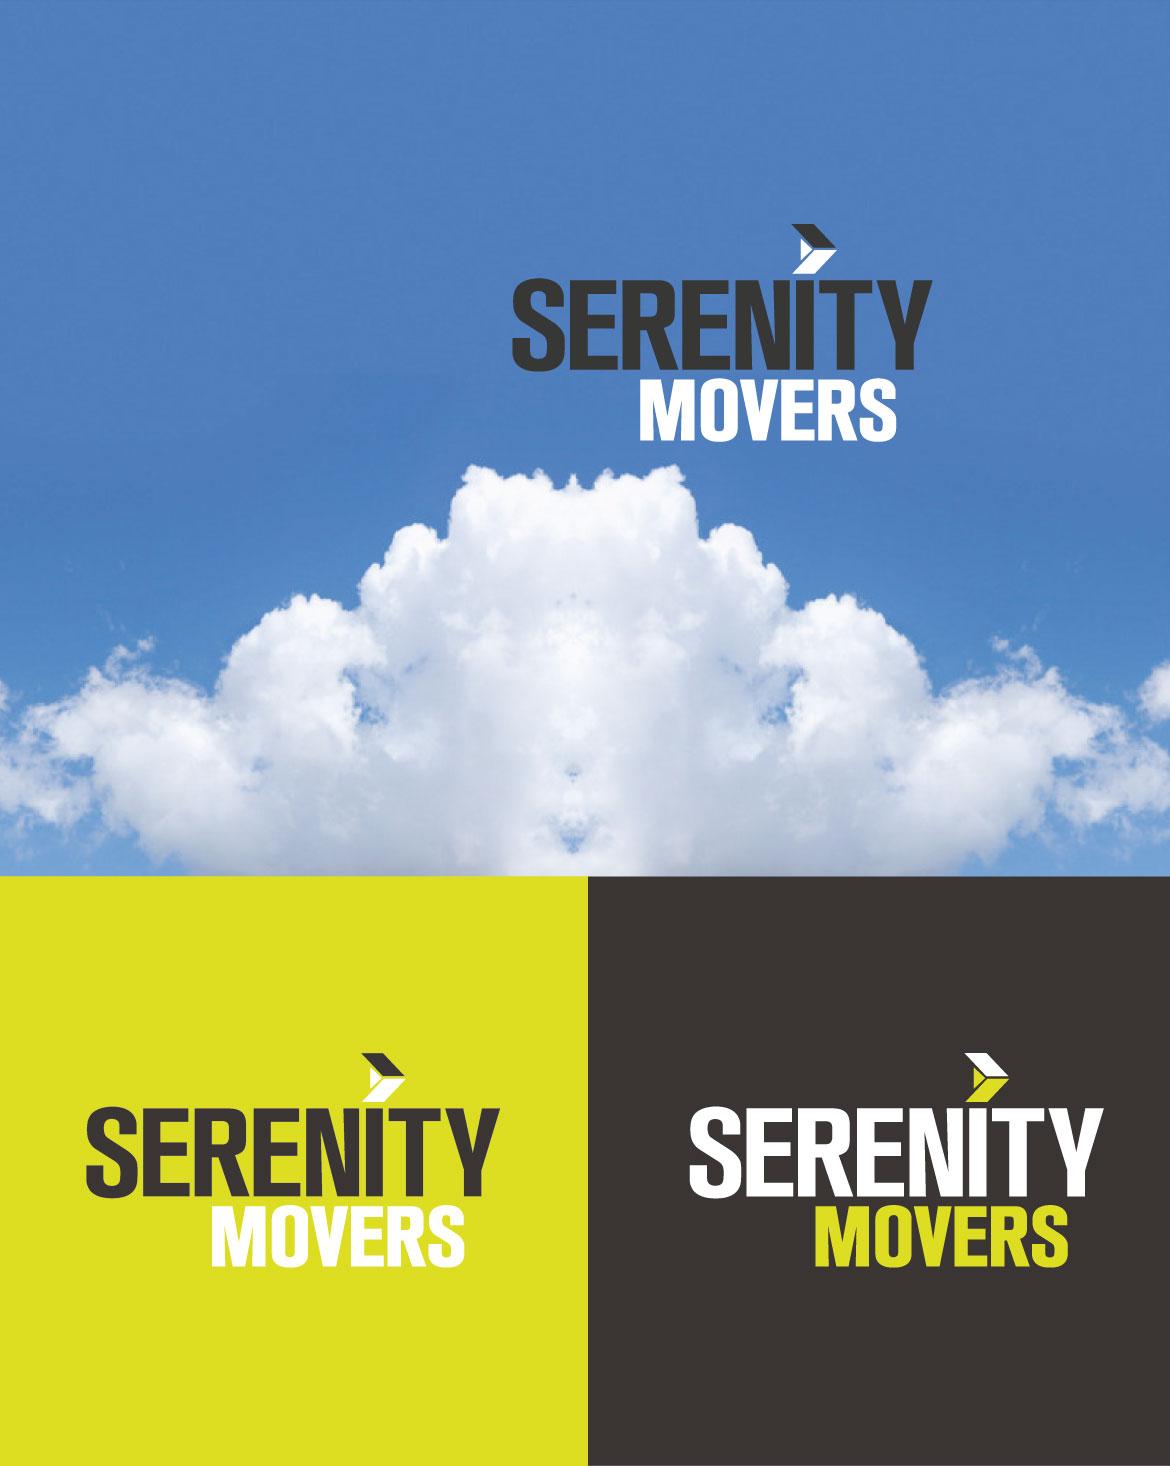 SerenityMovers_Branding_NotFromHere.LogoDesign_MovingCompany